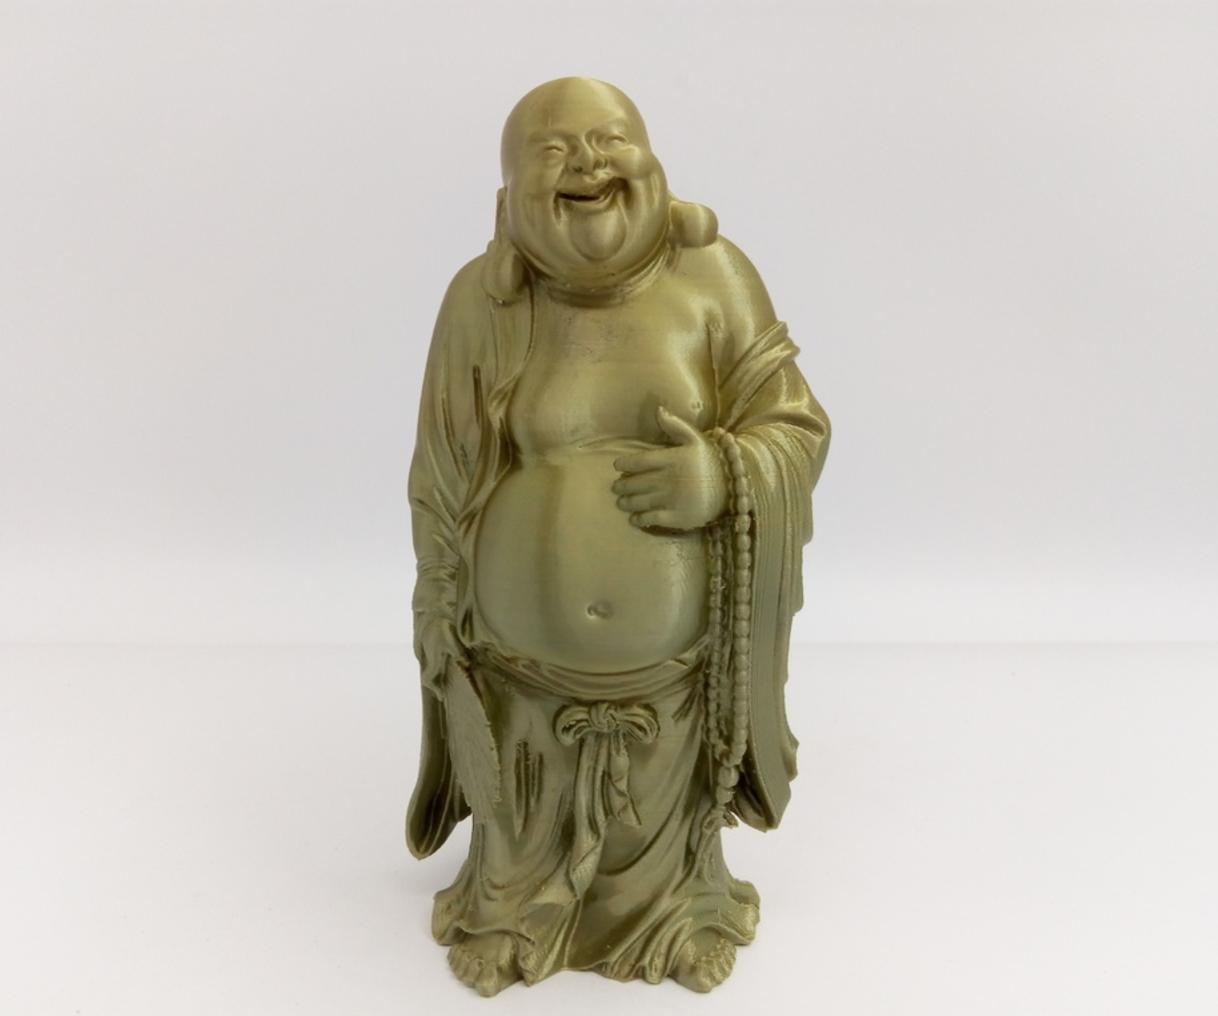 Capture d'écran 2016-11-23 à 16.44.05.png Download free STL file Smilling Buddha • 3D printing design, stronghero3d